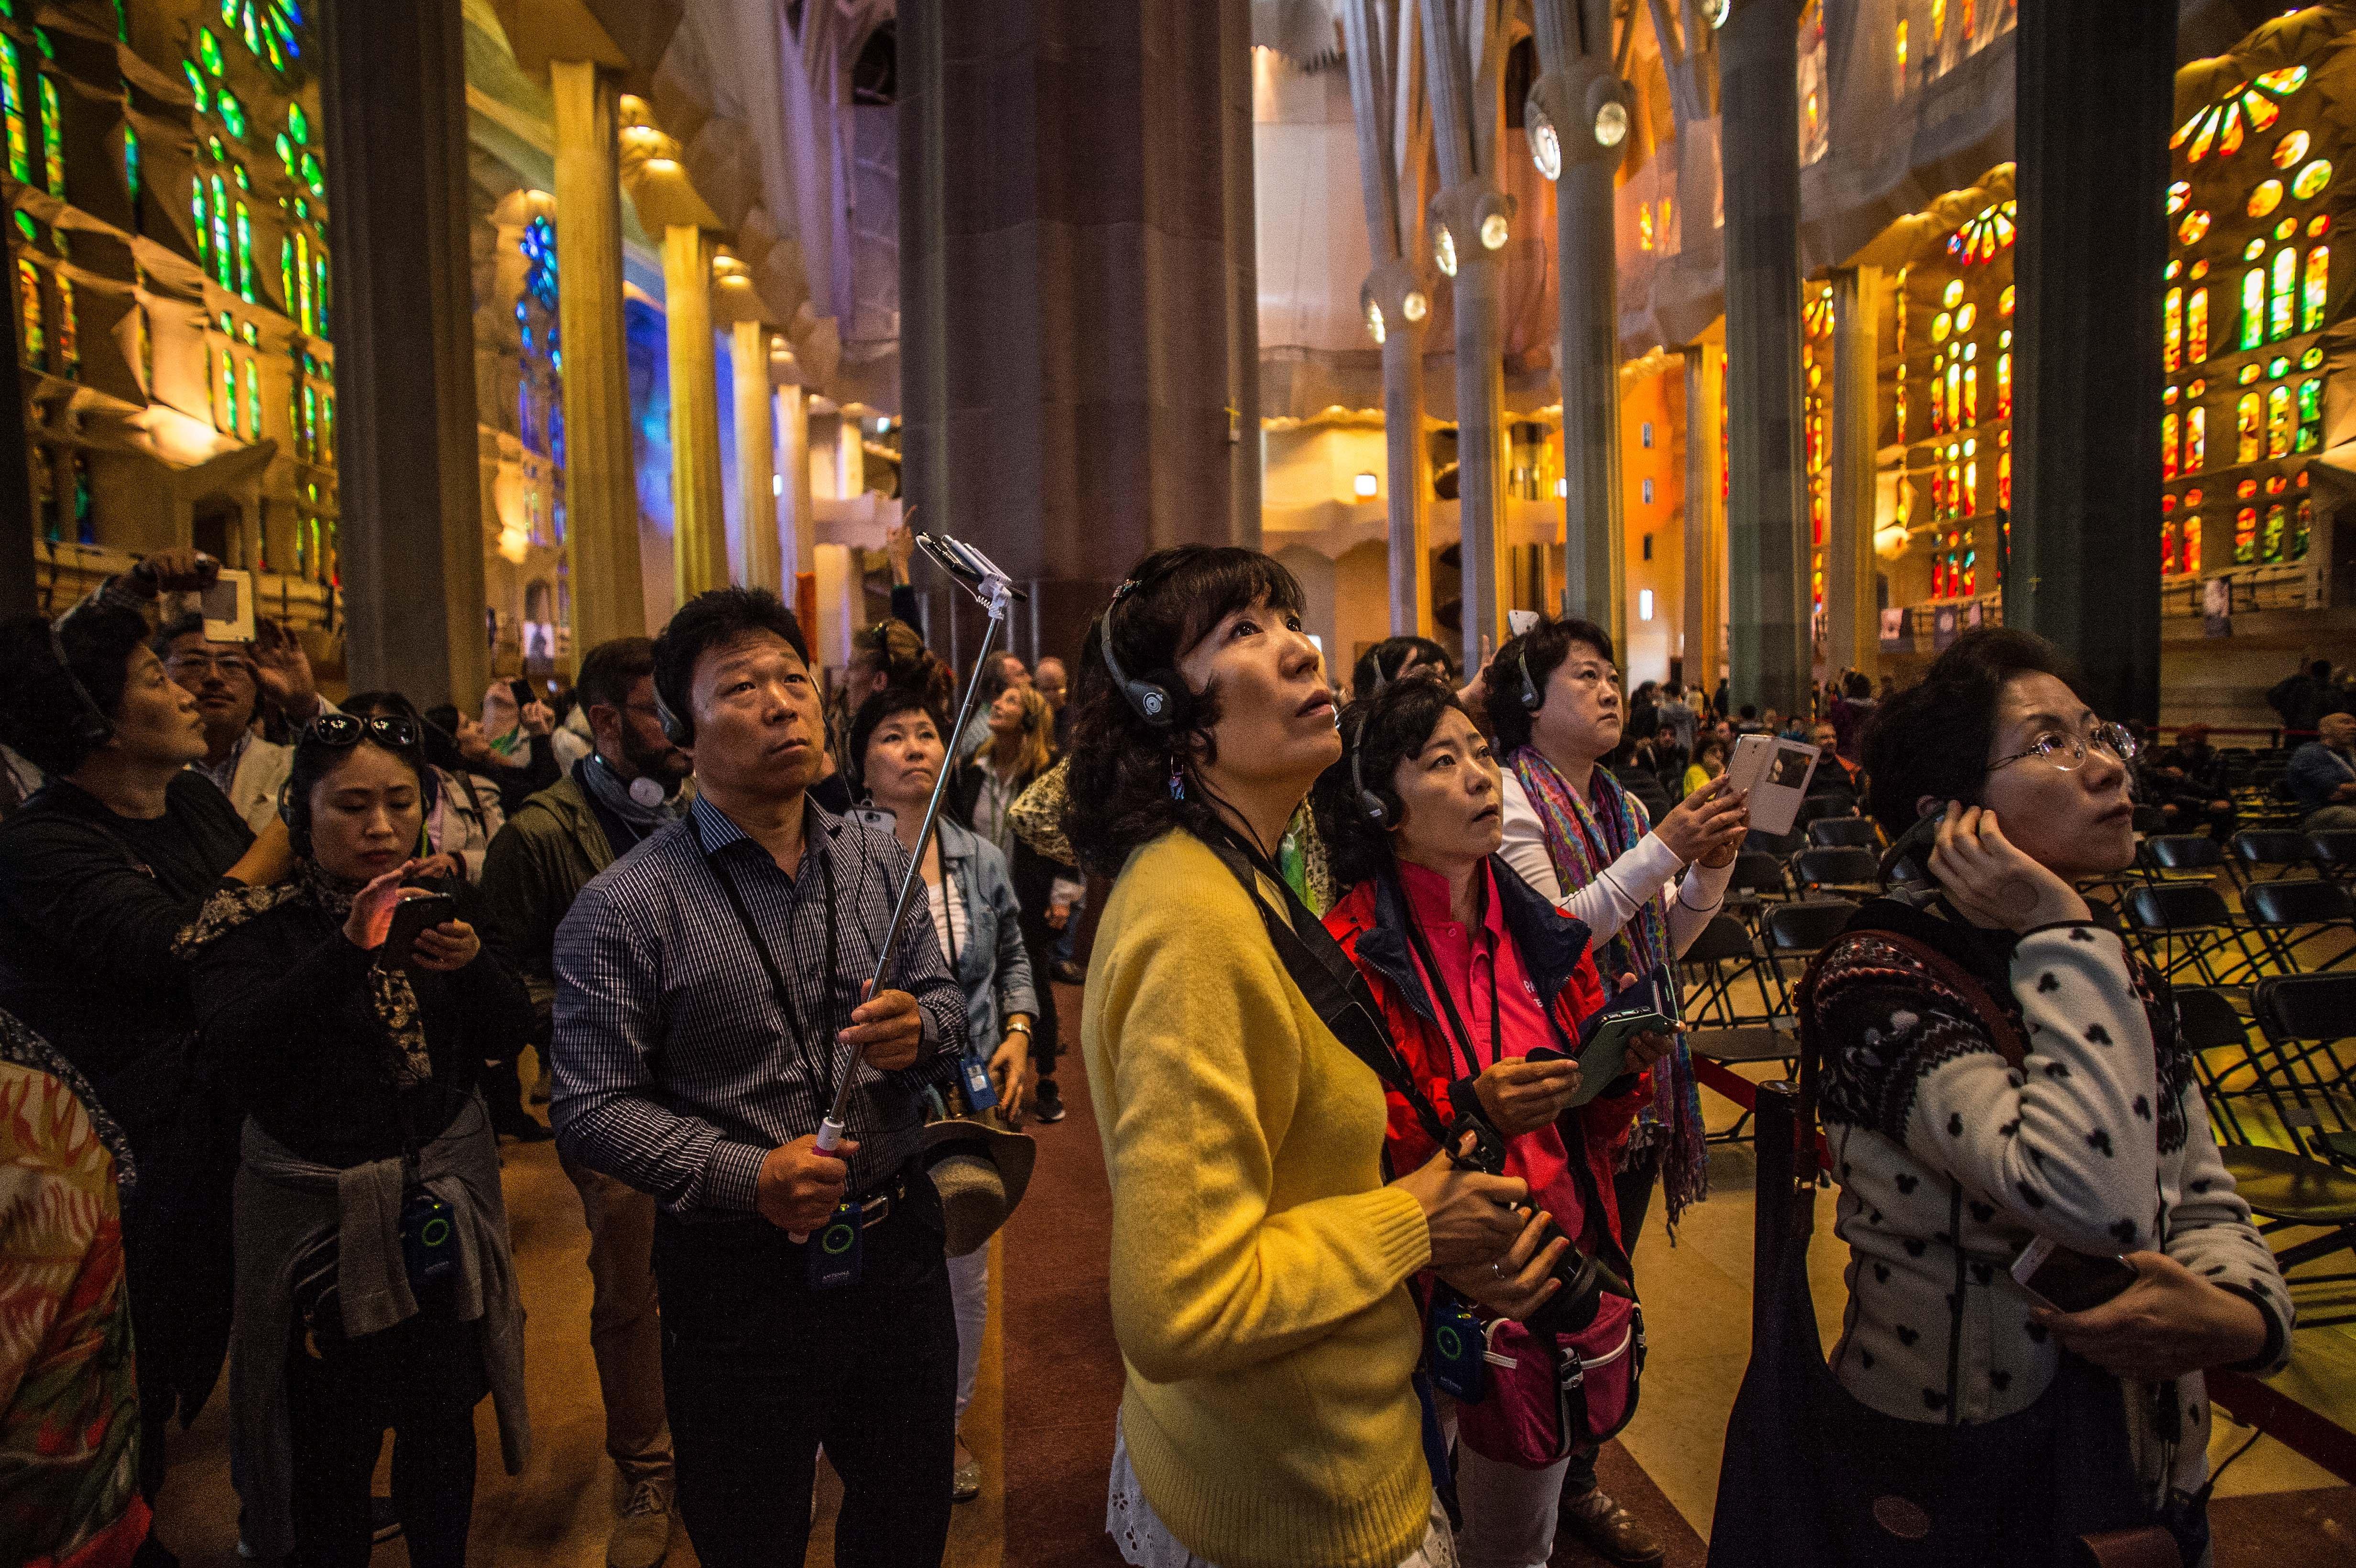 Tourists visit the Basilica of 'La Sagrada Familia' in Barcelona on Oct. 26, 2015.